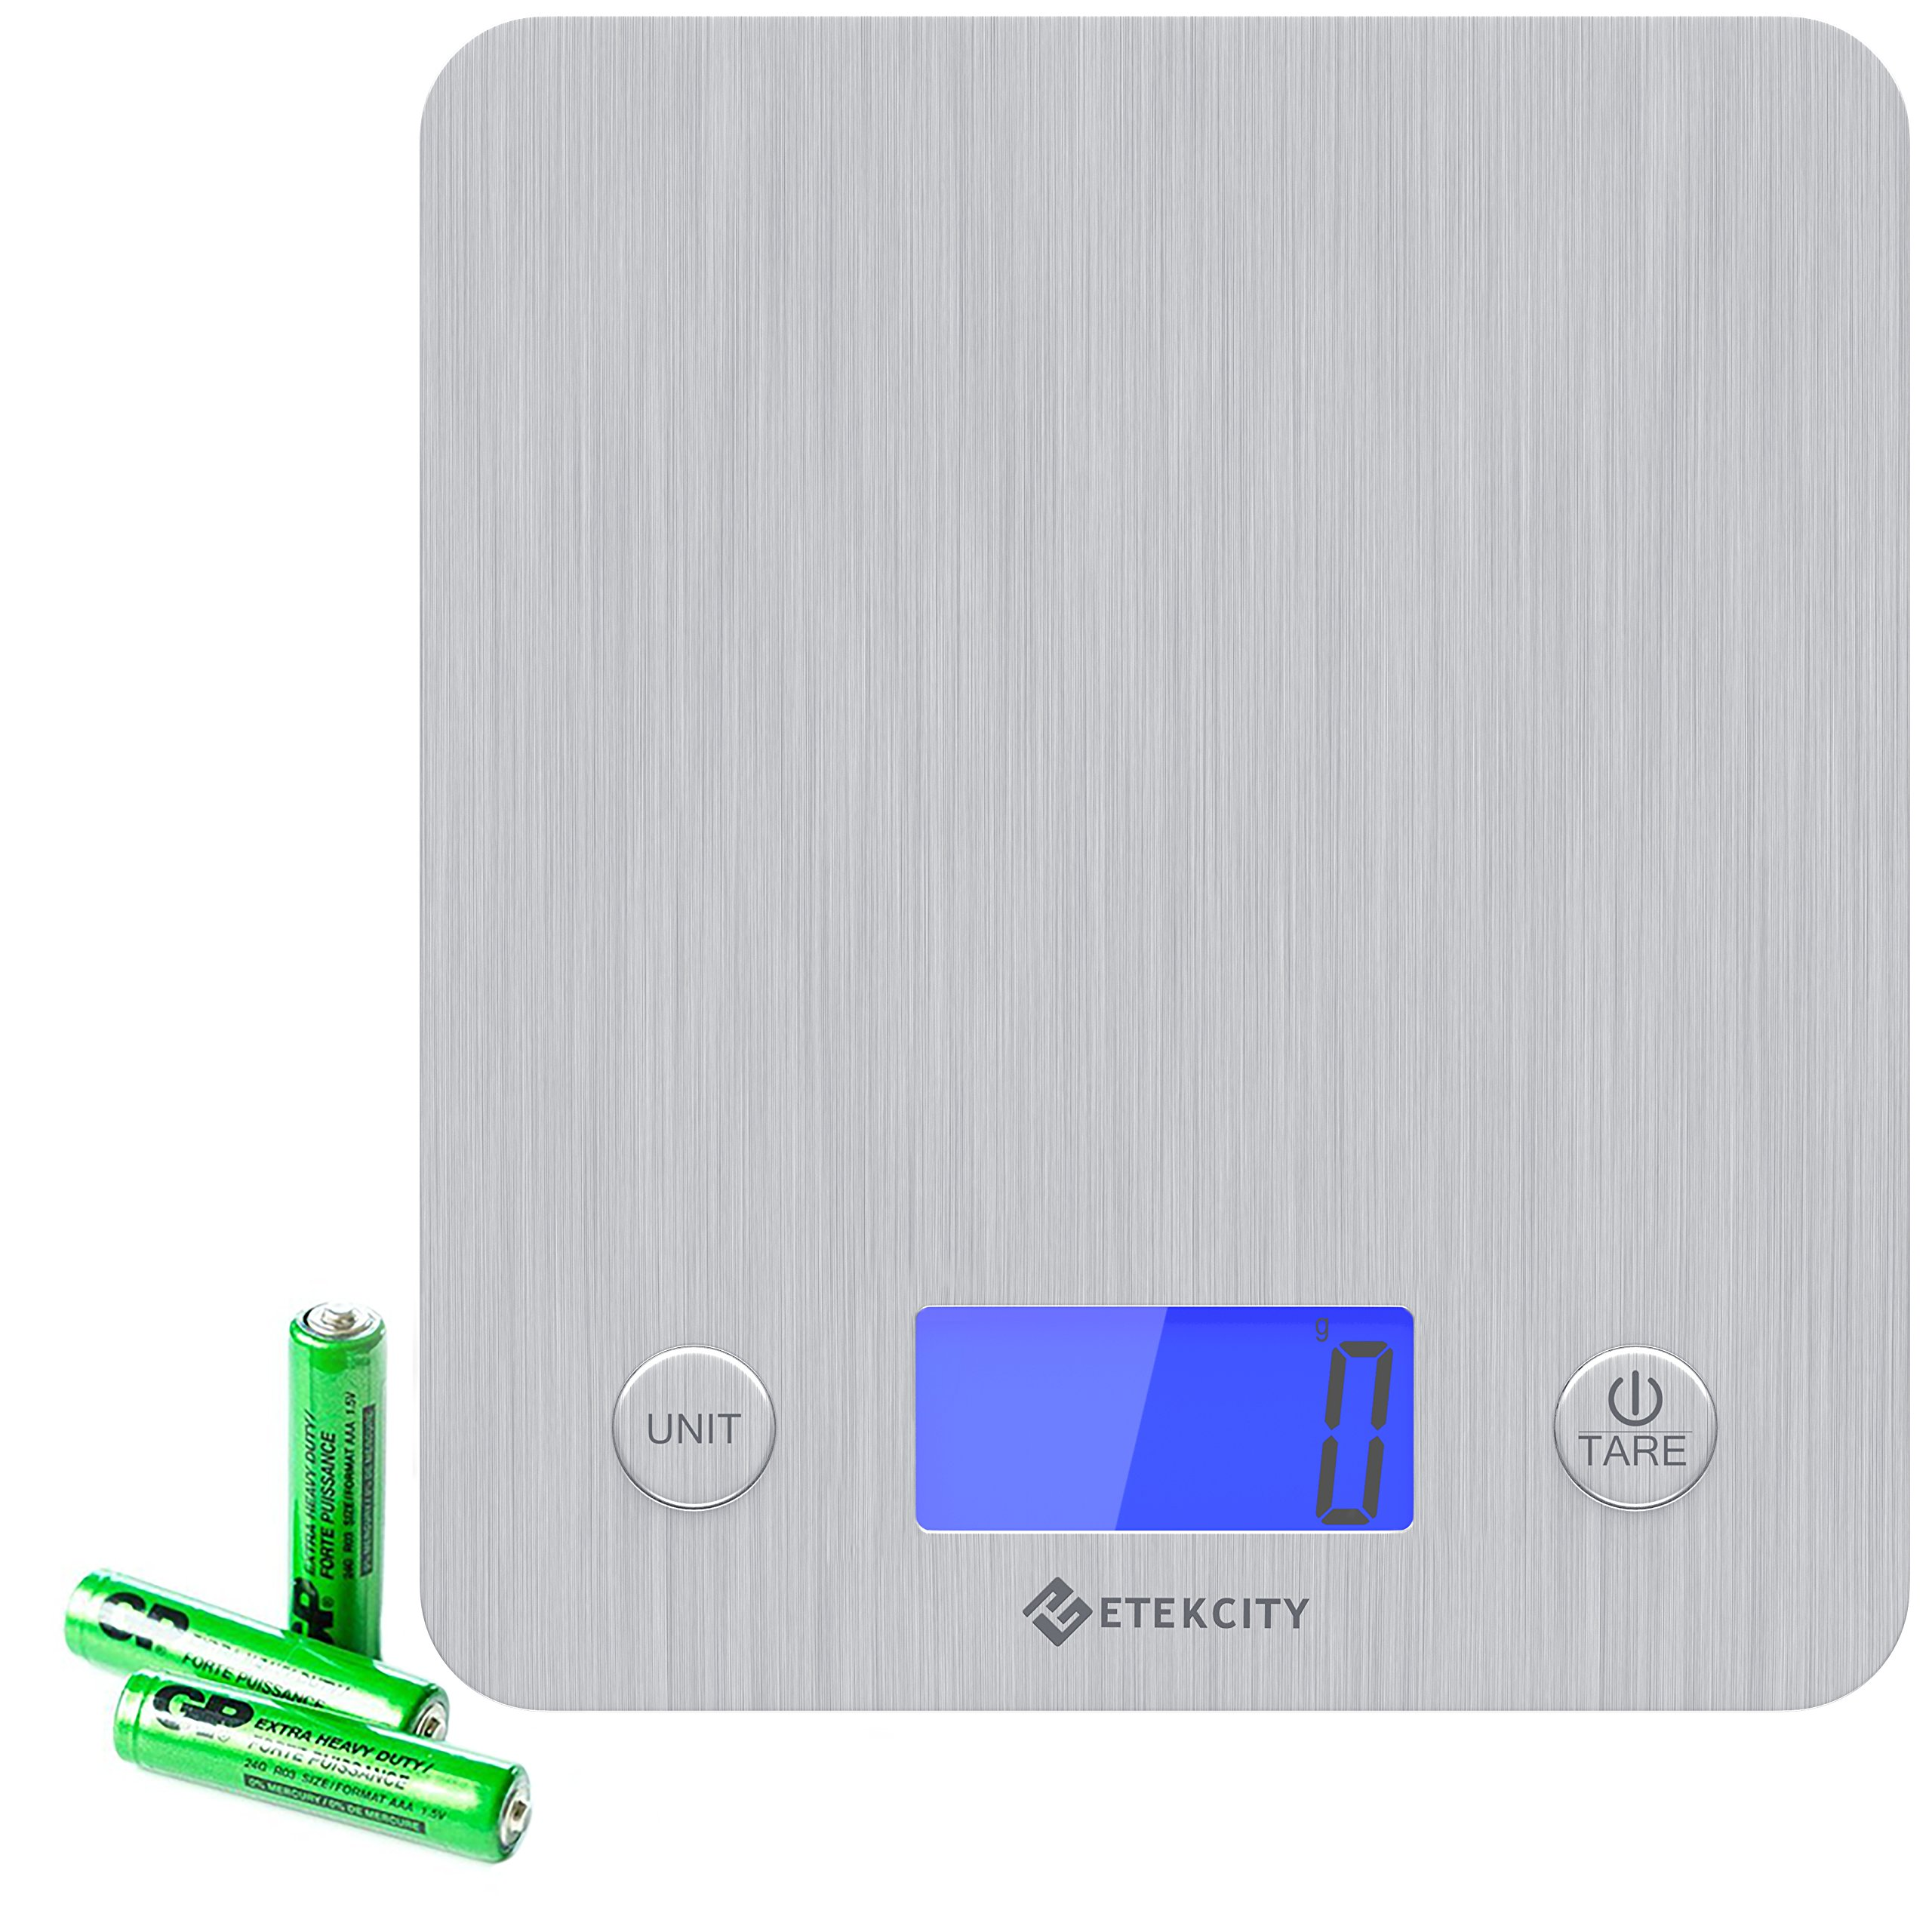 Etekcity EK6211 Digital Kitchen Multifunction Food Scale with Large Platform 11lb 5kg, Batteries Included (Stainless Steel)